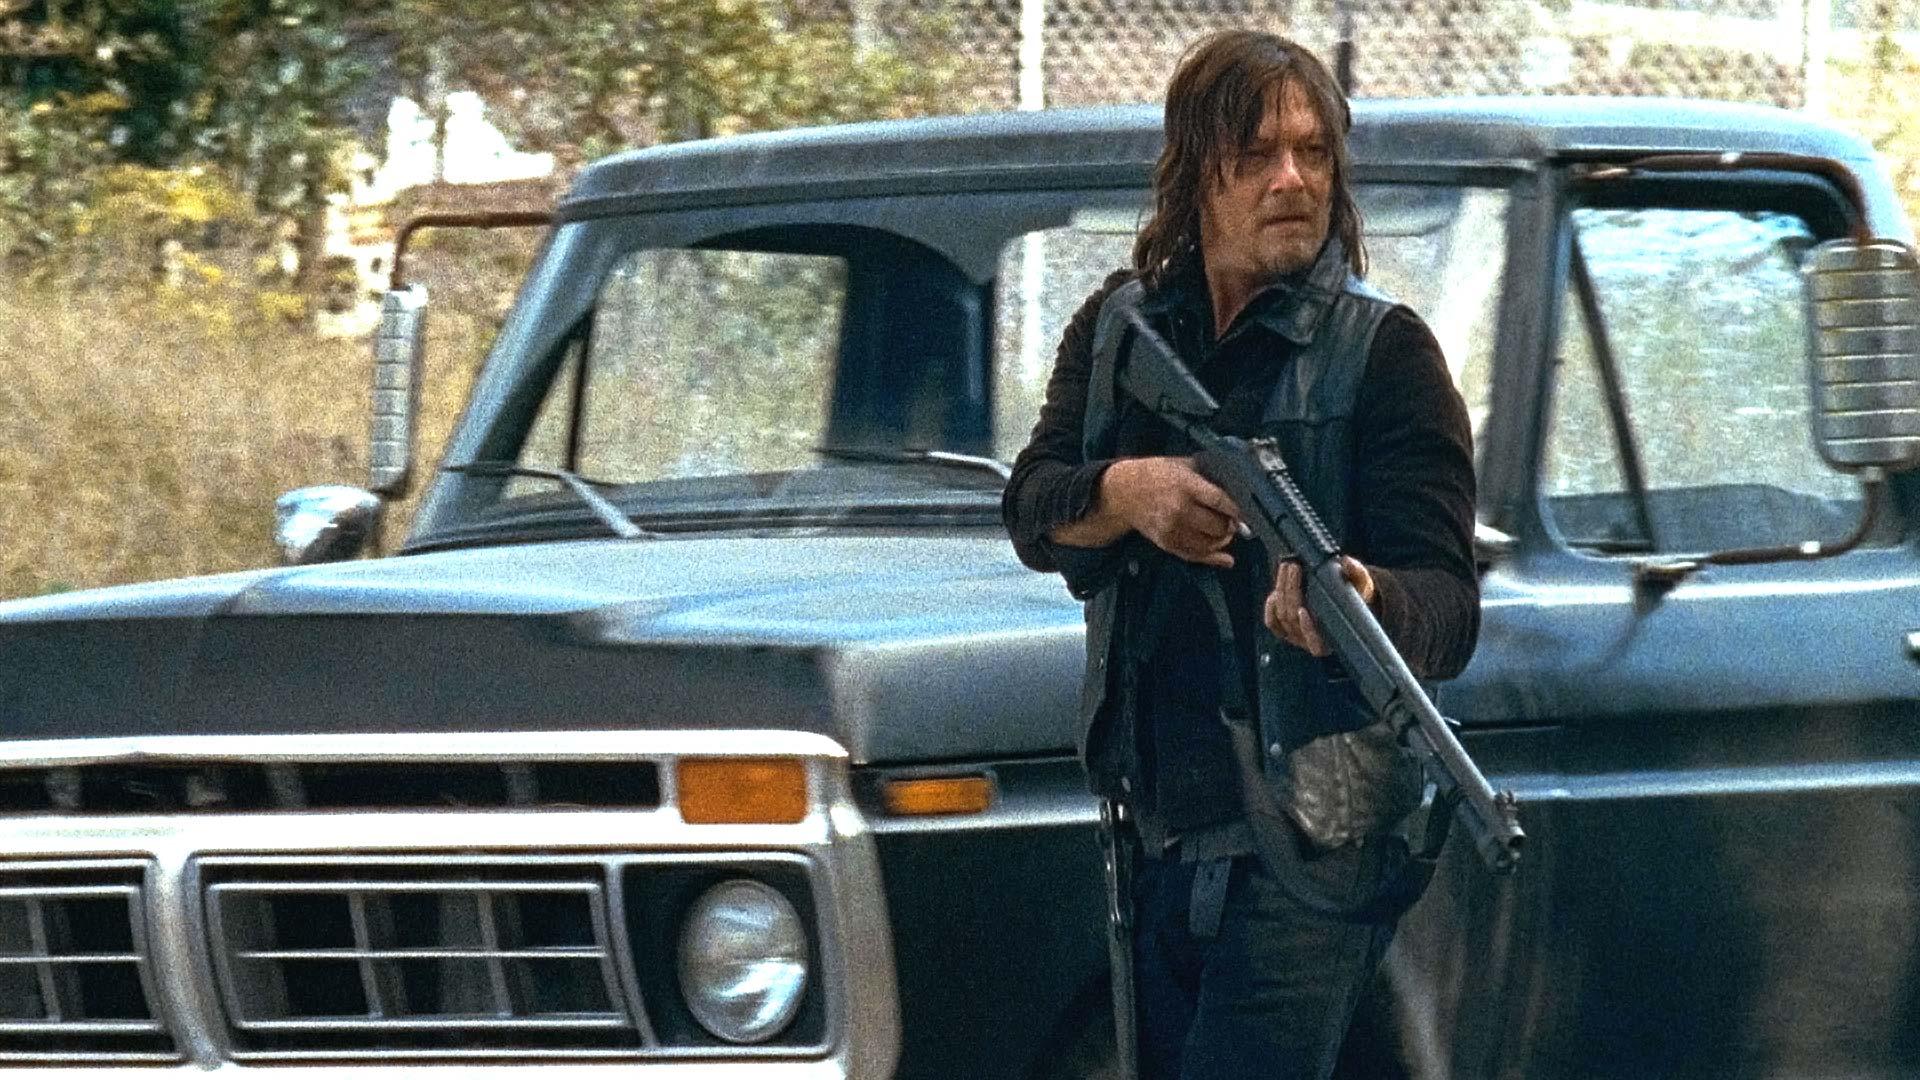 Video Extra - The Walking Dead - Next On Episode 614 The Walking Dead Twice  As Far - AMC